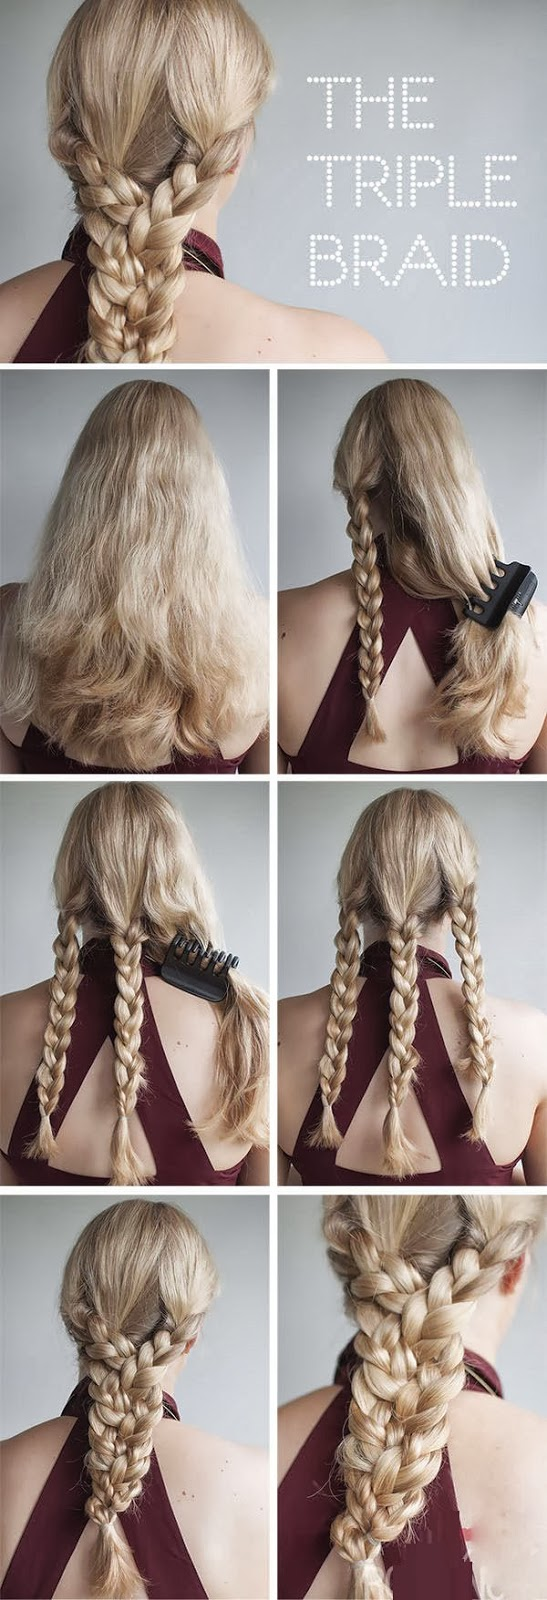 triple braid diy